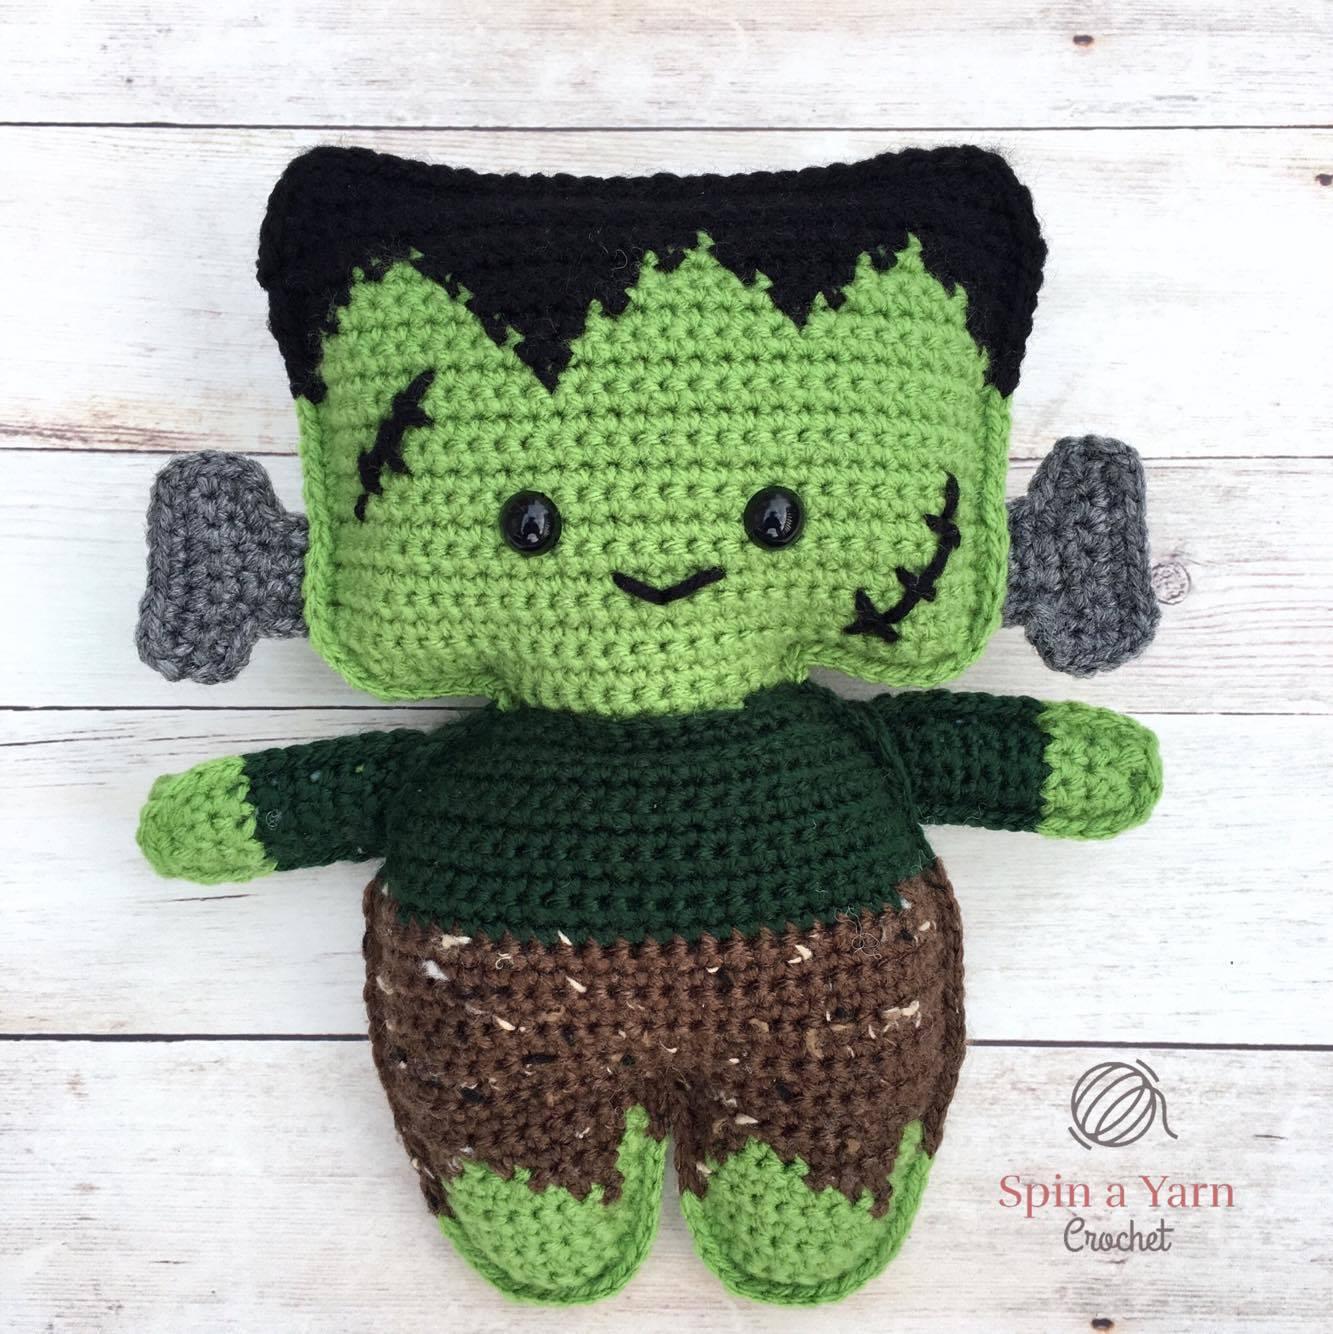 Amigurumi Monster Pattern Free Crochet : Frankenstein s monster free crochet pattern u spin a yarn crochet